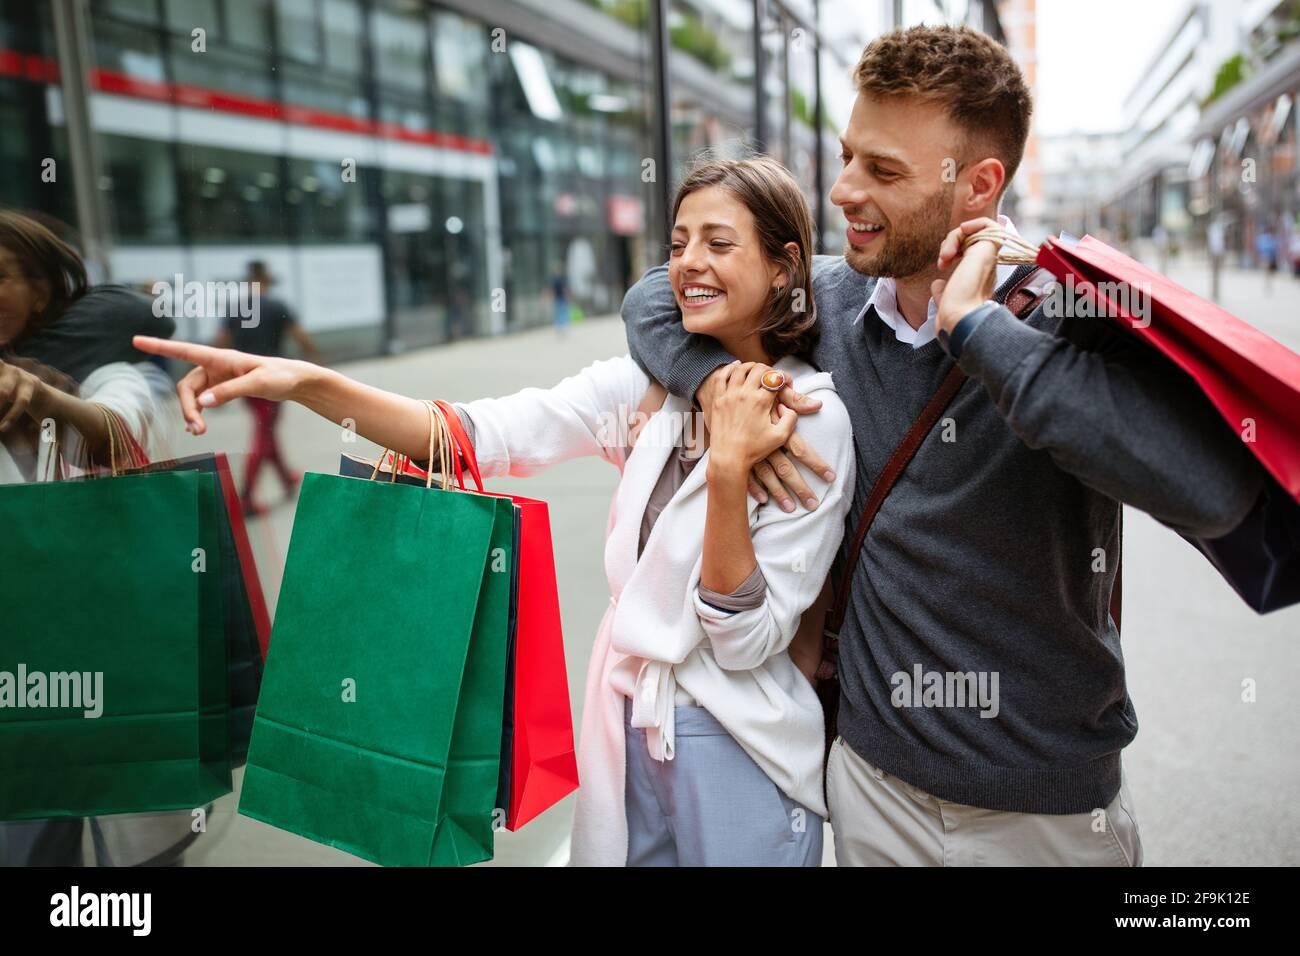 Bella giovane coppia godendo in shopping, divertendosi insieme. Foto Stock